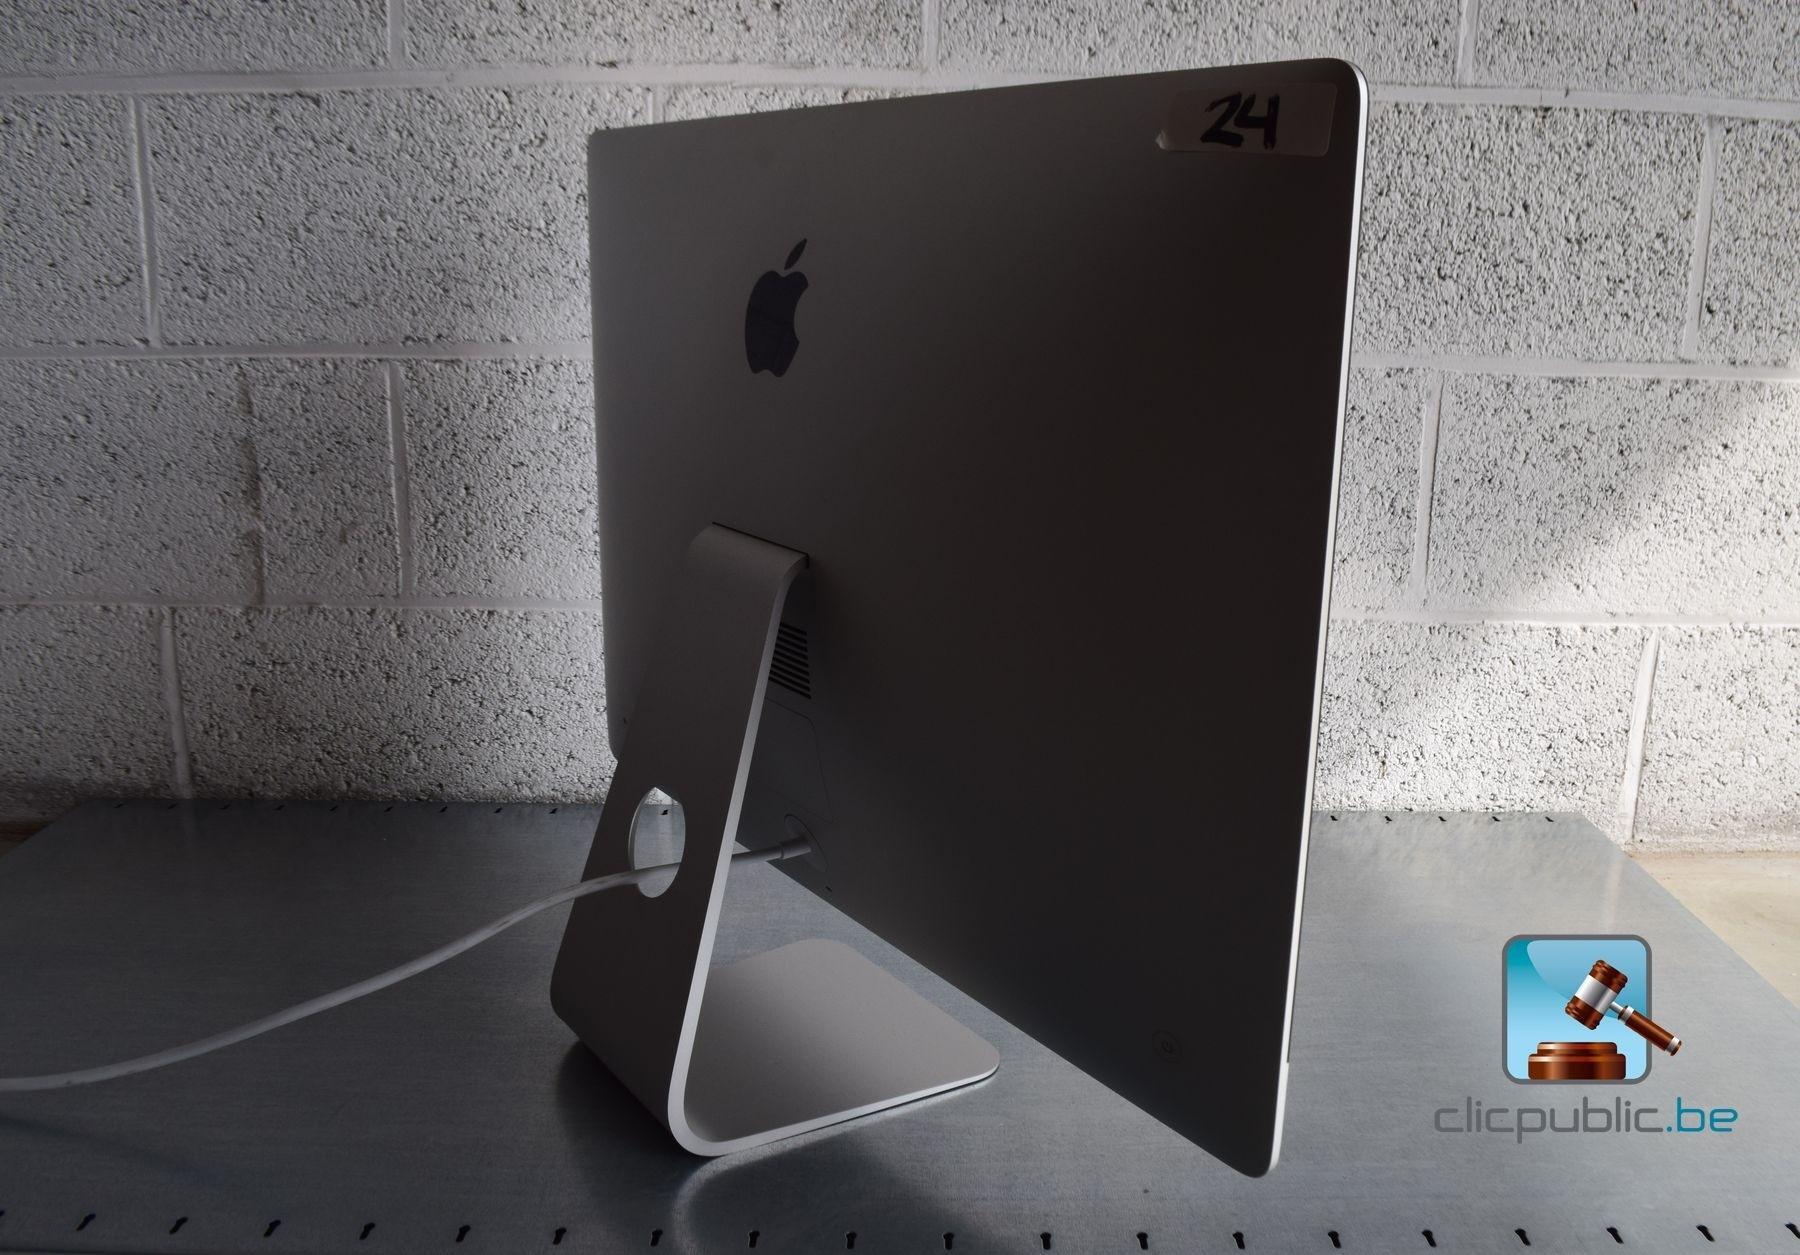 ordinateur de bureau apple imac dans un tat proche du. Black Bedroom Furniture Sets. Home Design Ideas